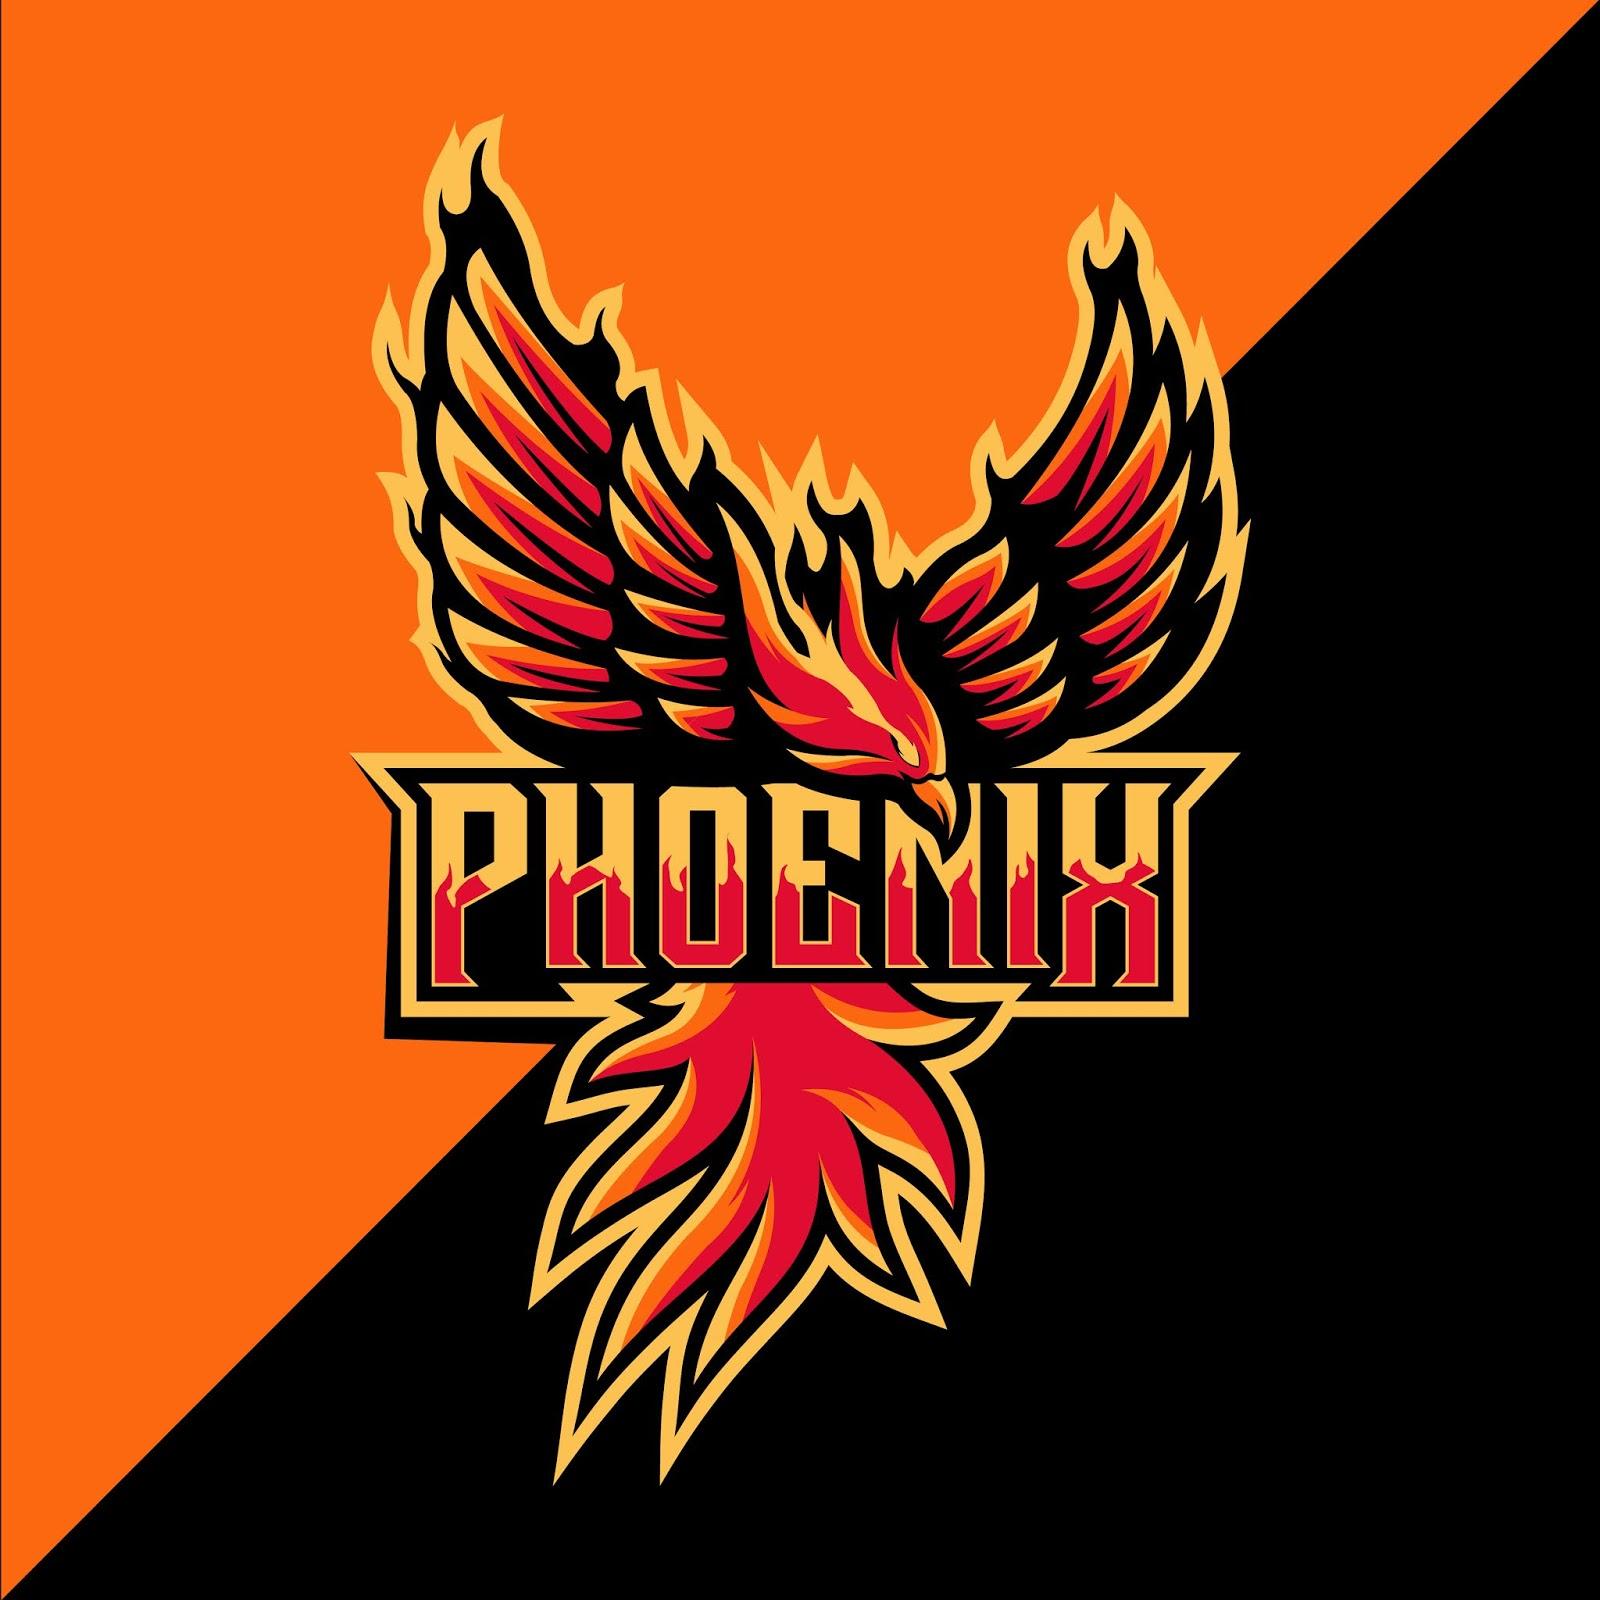 Phoenix Sport Mascot Logo Design Free Download Vector CDR, AI, EPS and PNG Formats